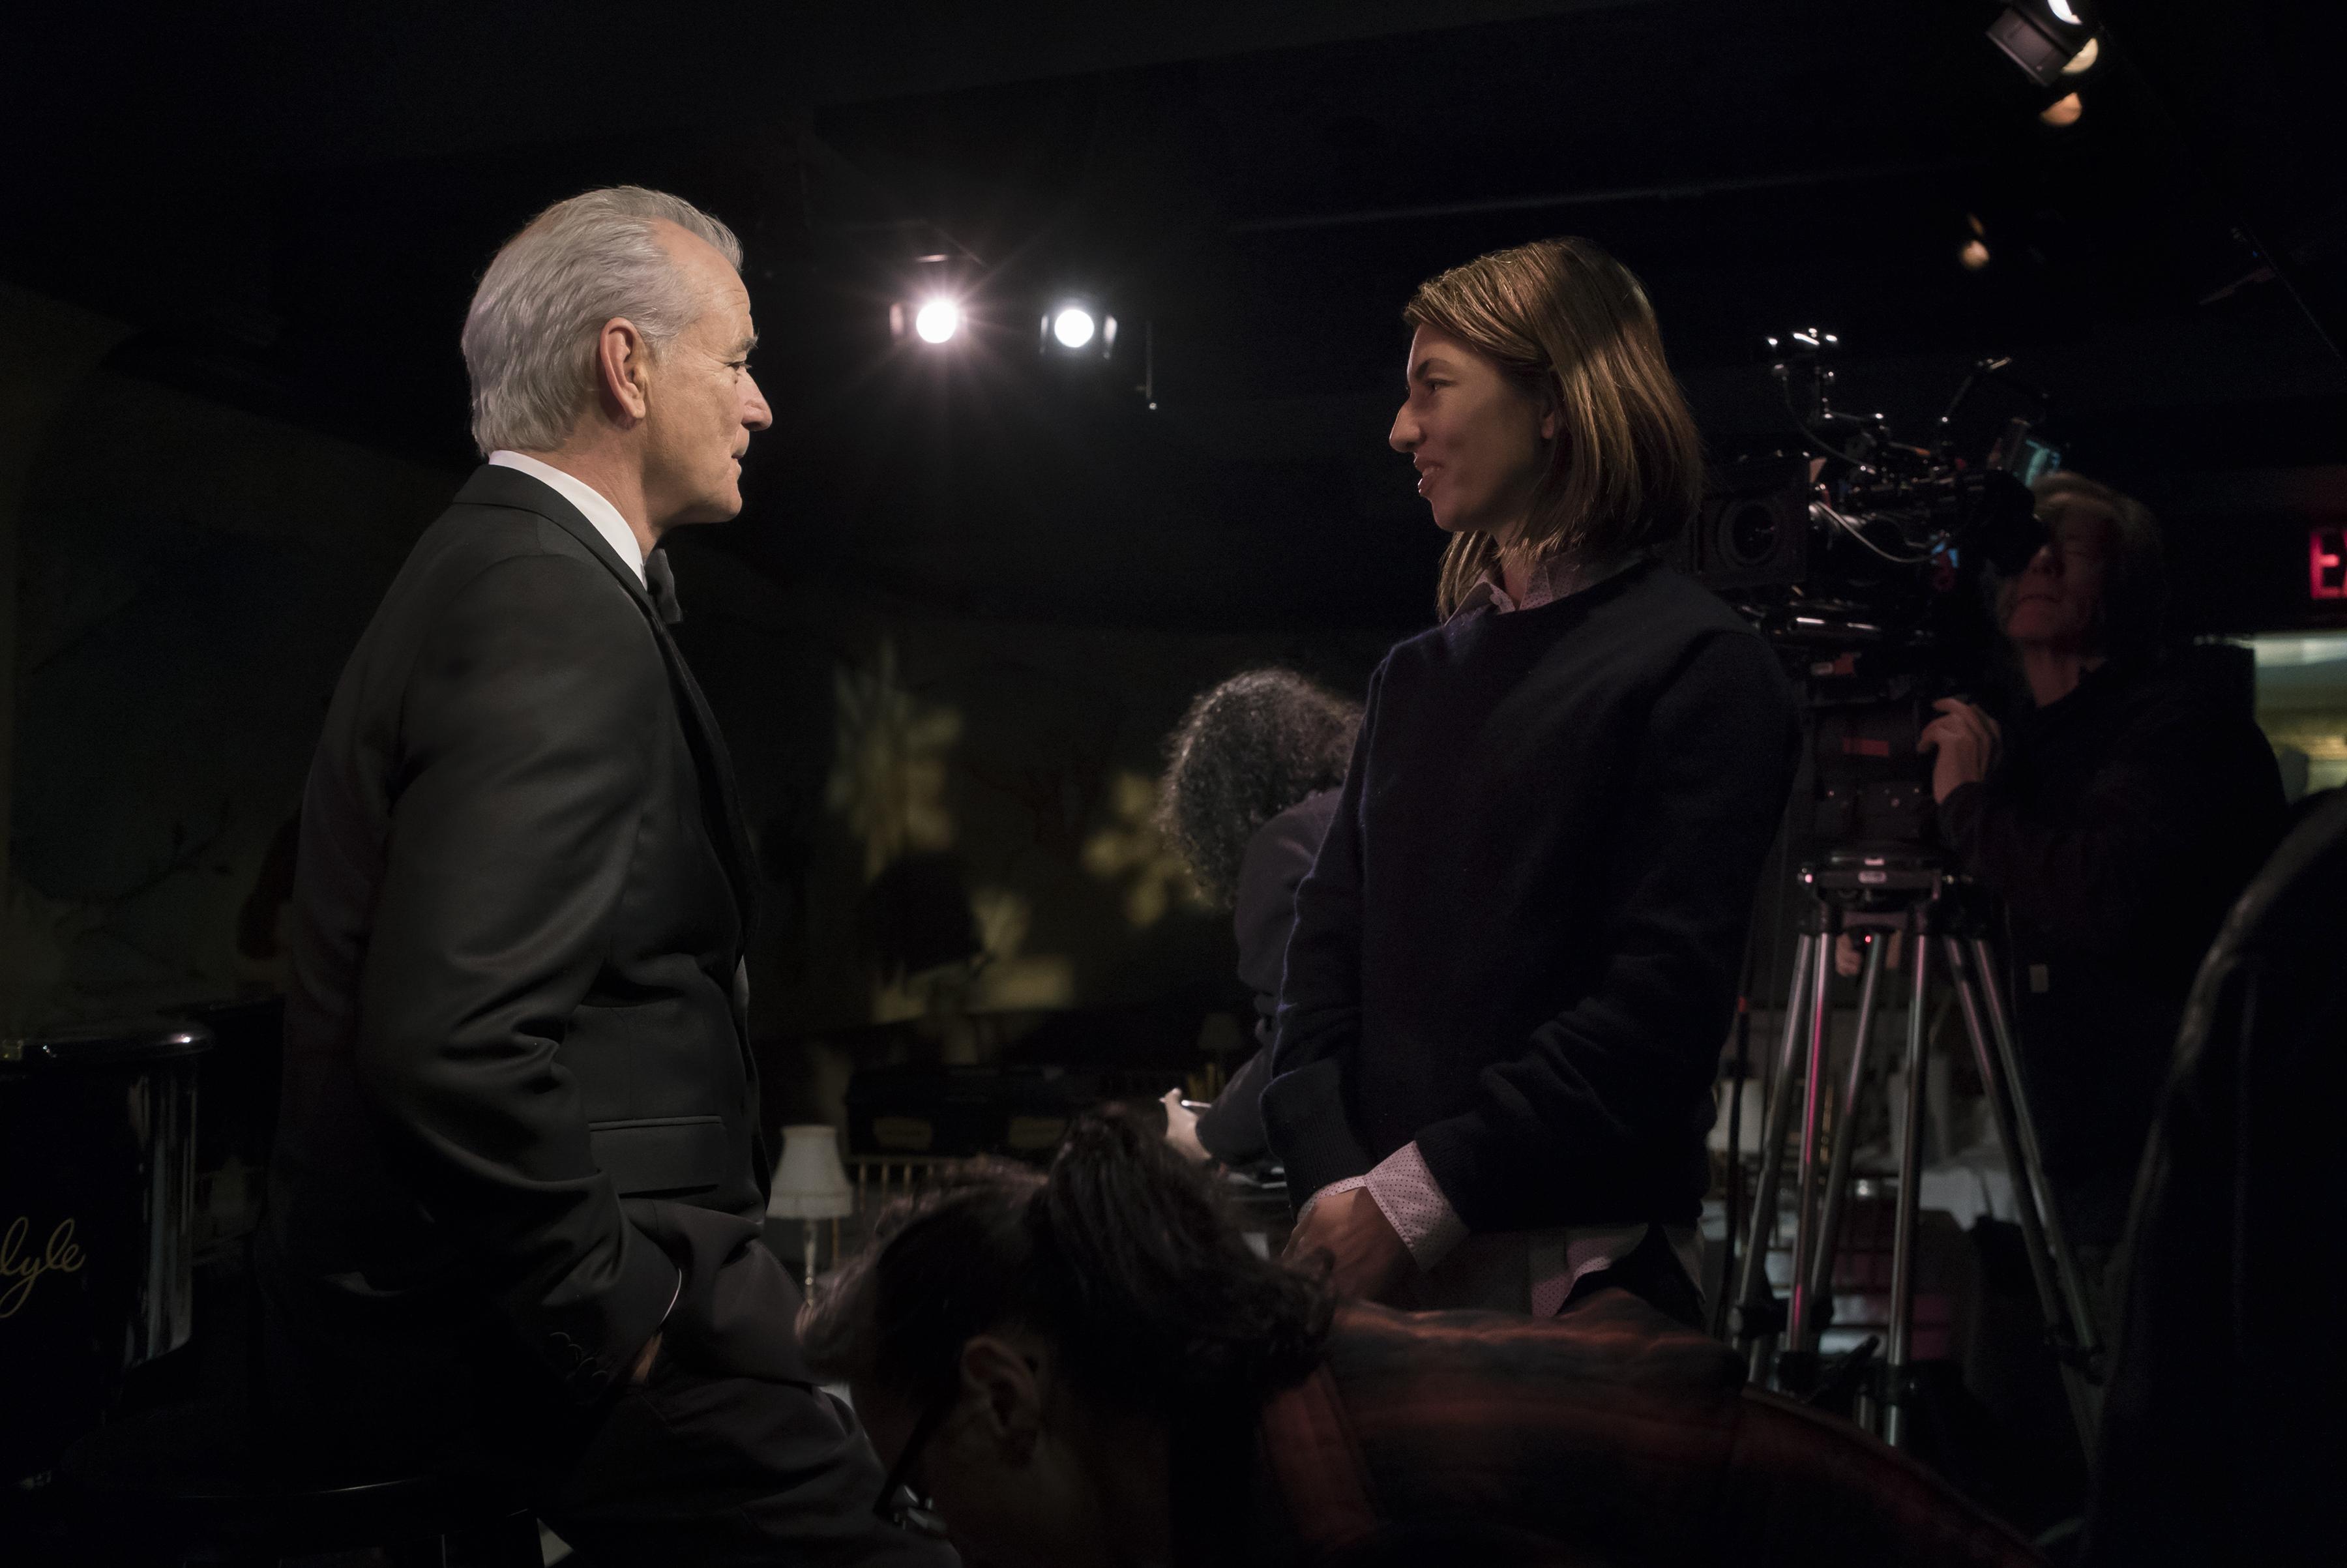 Bill Murray and Sofia Coppola on the set of A Very Murray Christmas.